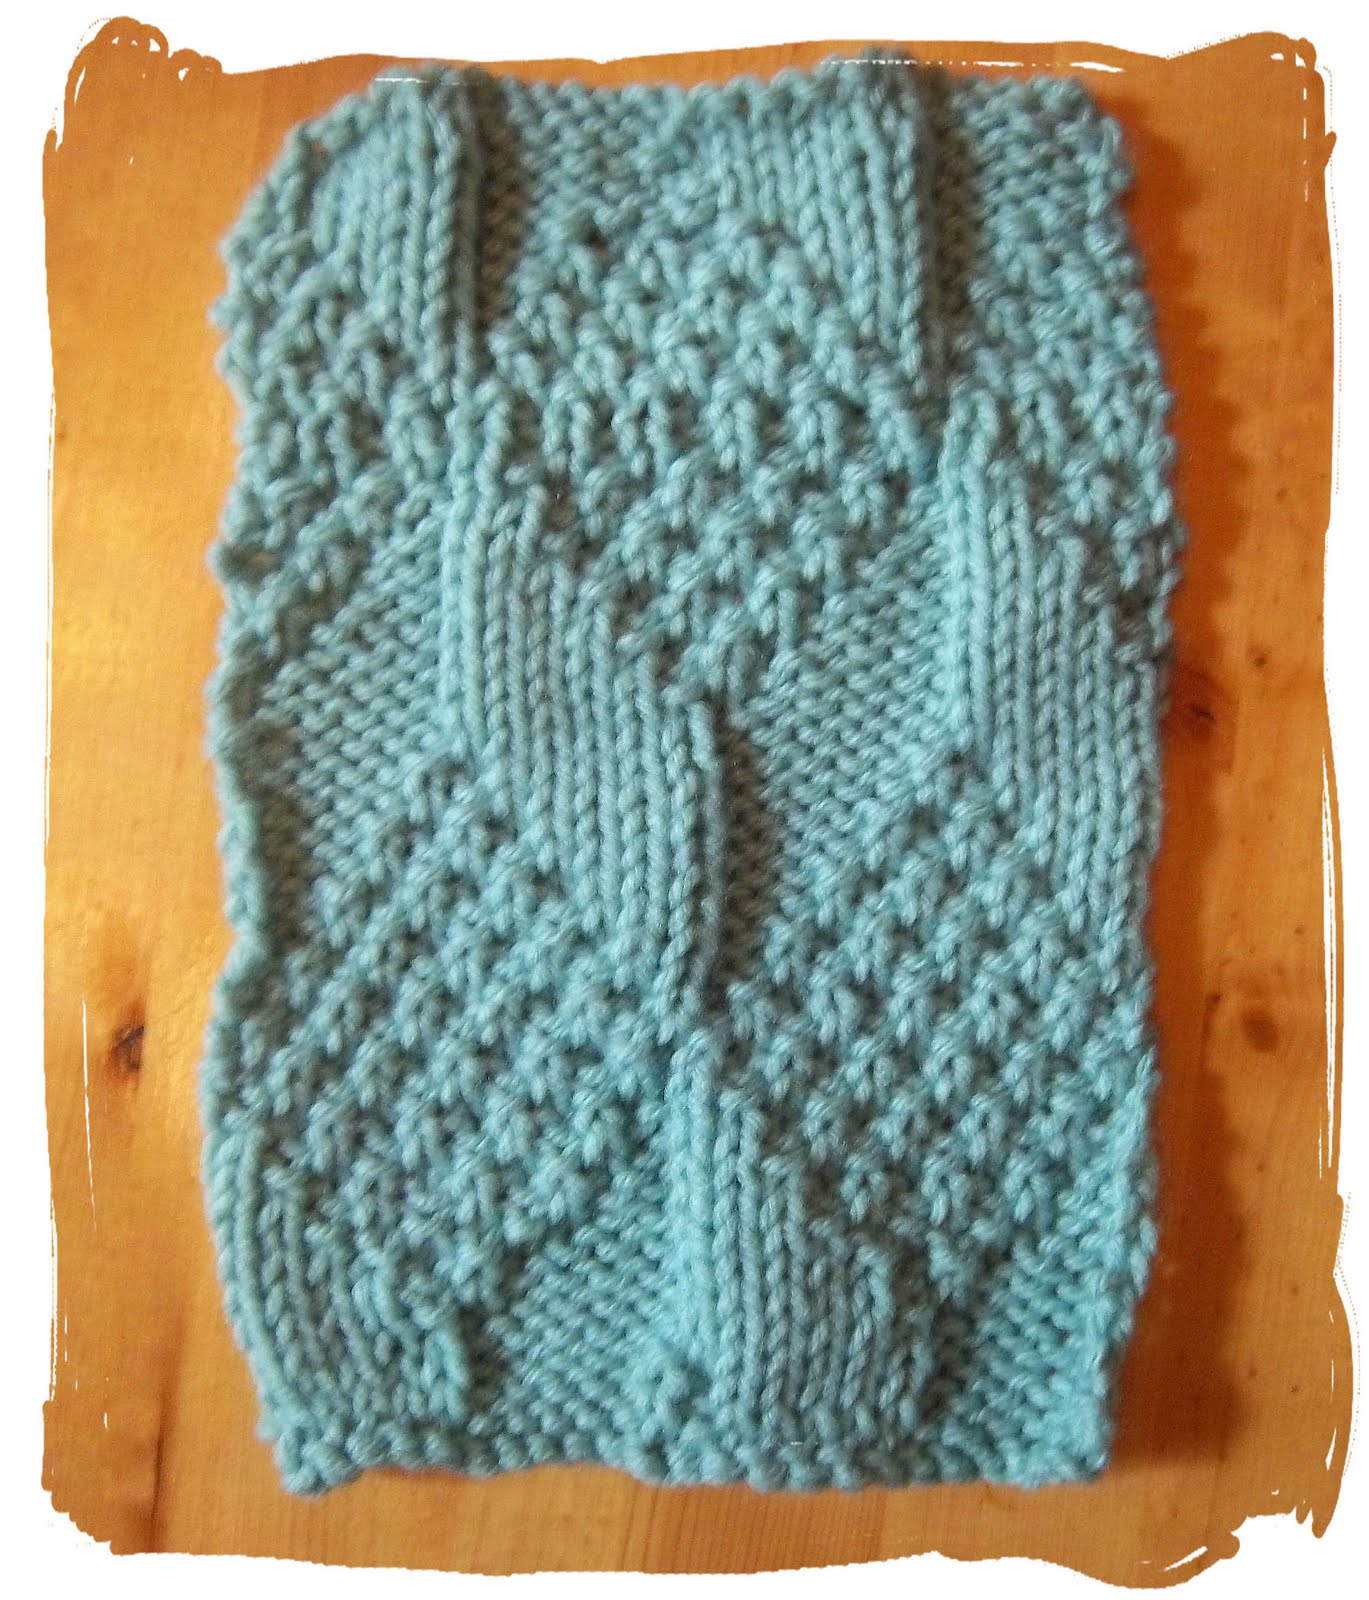 knitting stitches-Knitting Gallery